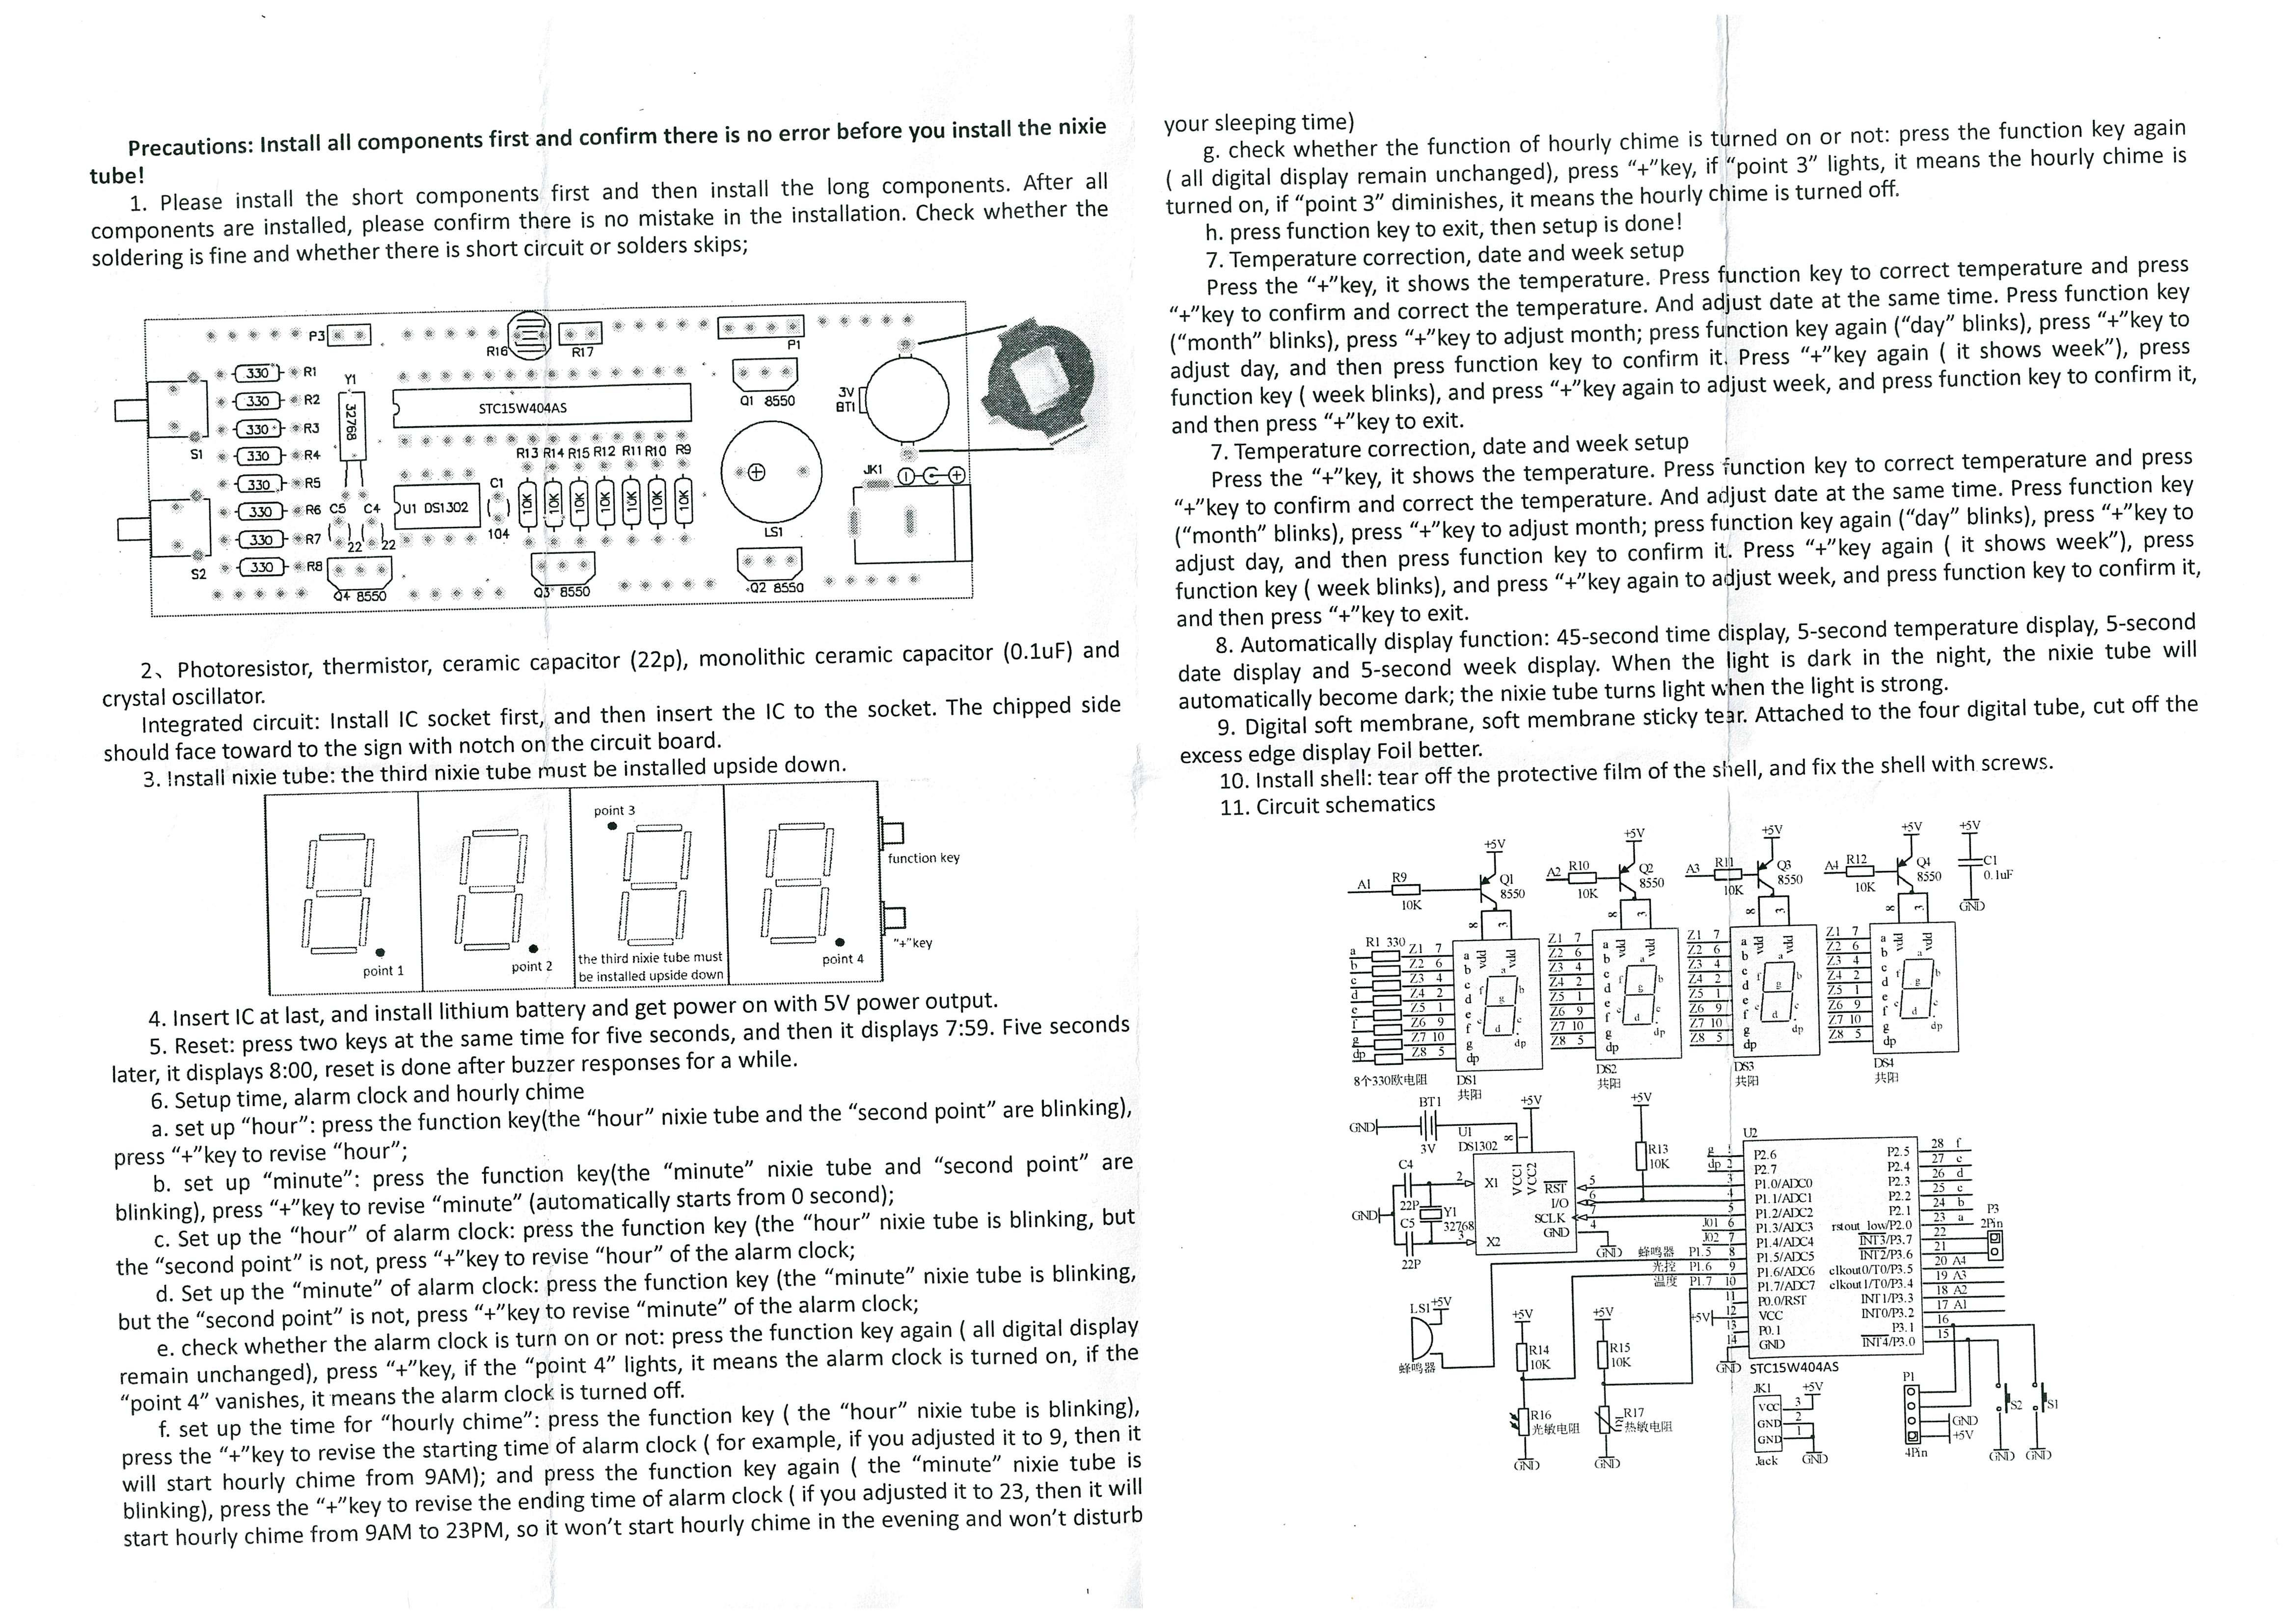 diy led uhr mit distanz sensor elektroforum. Black Bedroom Furniture Sets. Home Design Ideas